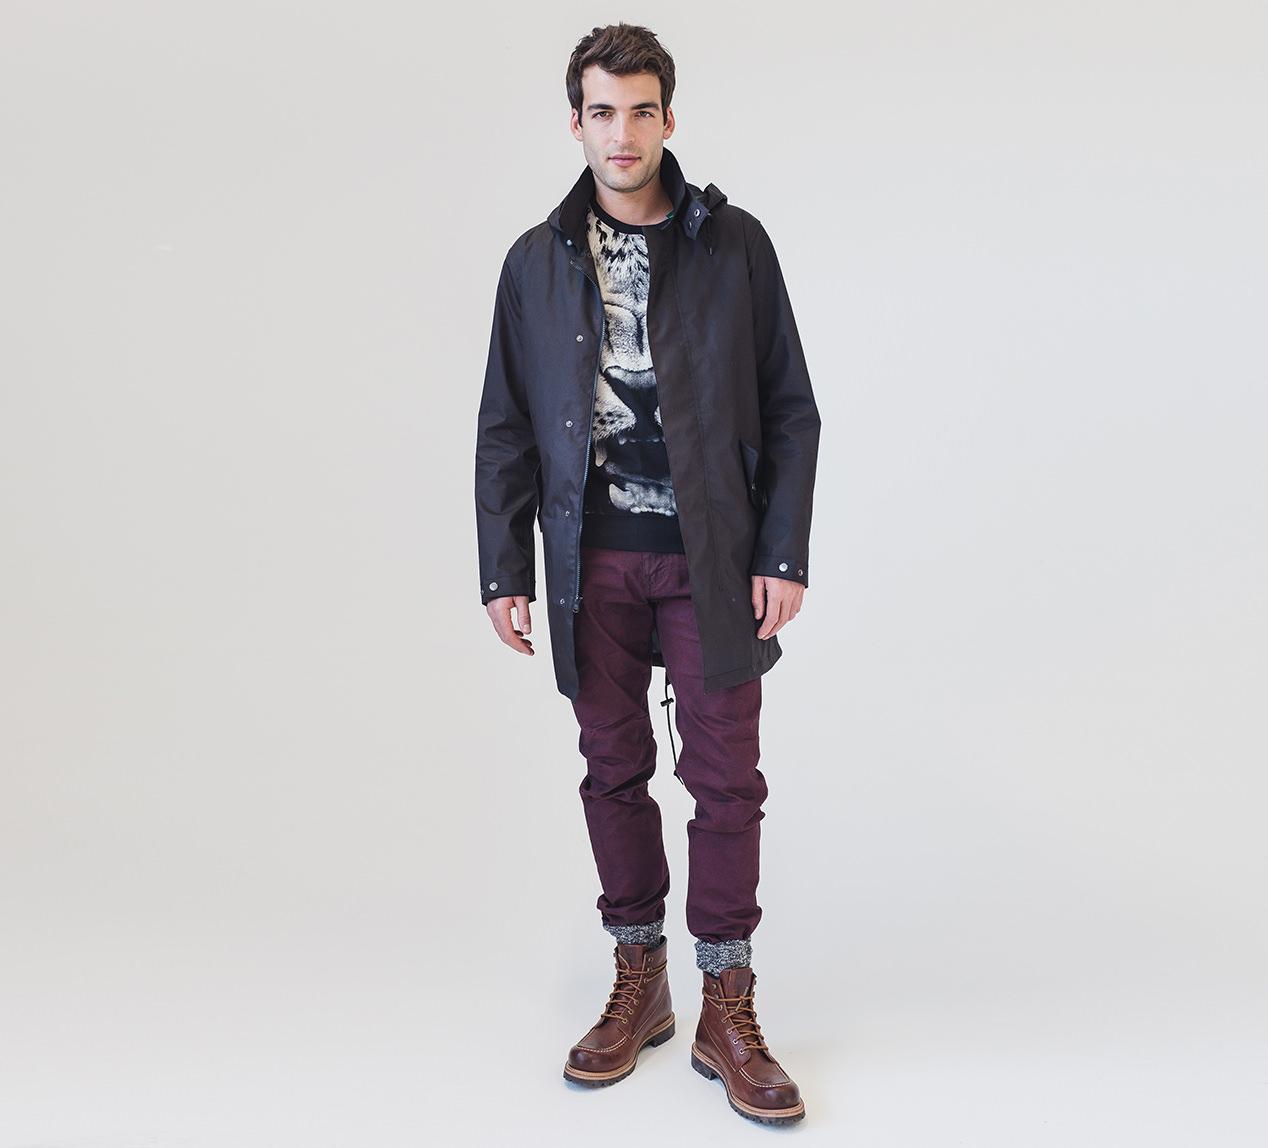 SV31-TT9_Mode_Casting_Fashion